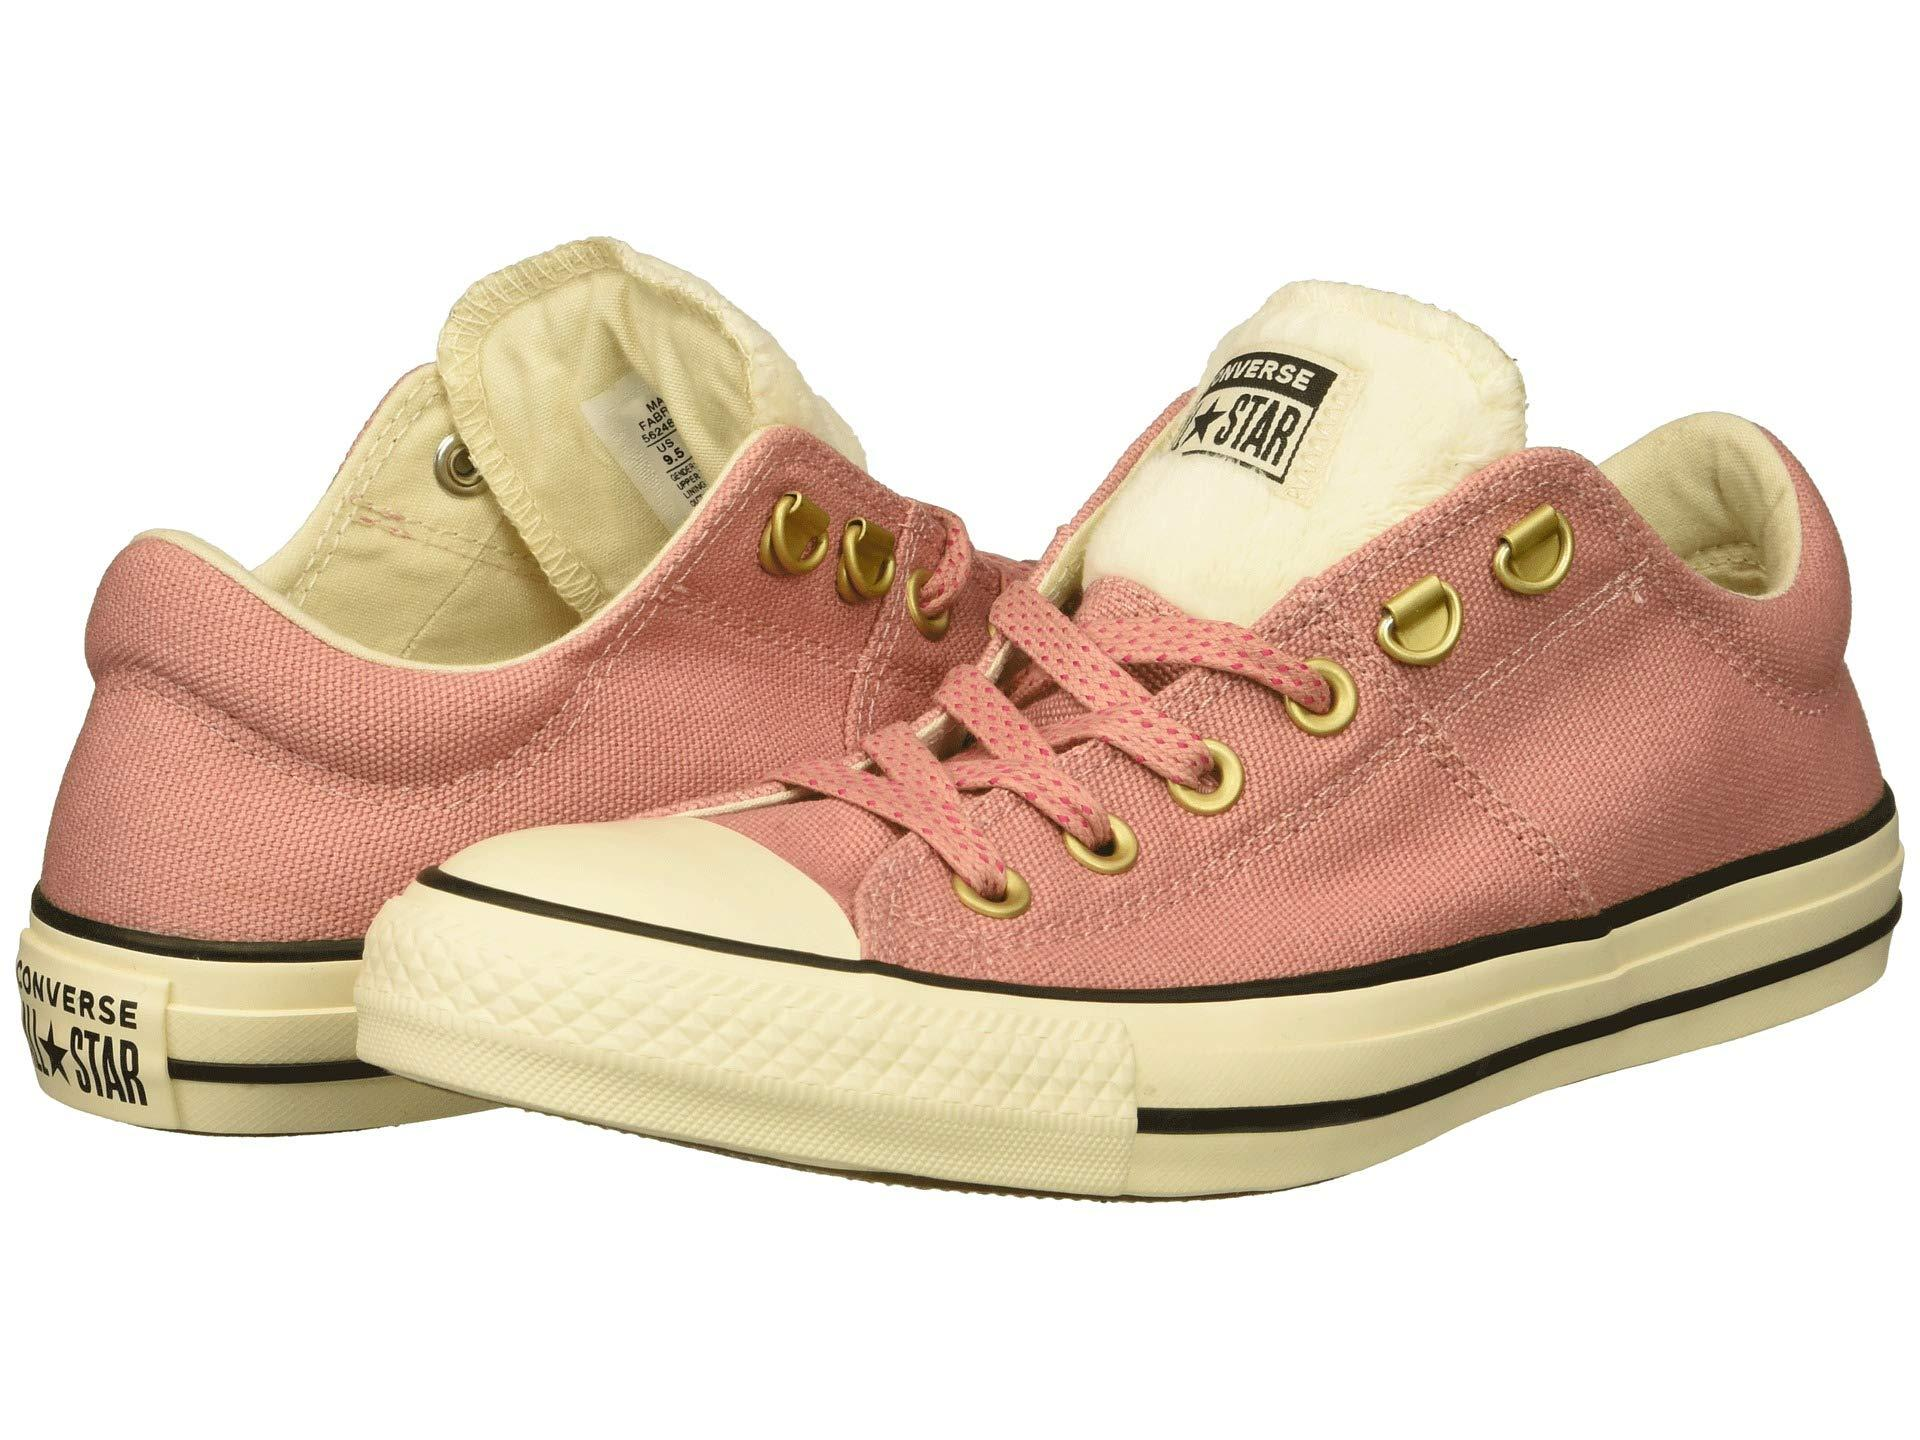 35a1dd25078f Converse - Pink Chuck Taylor All Star Faux Fur Madison Low Top Sneaker -  Lyst. View fullscreen